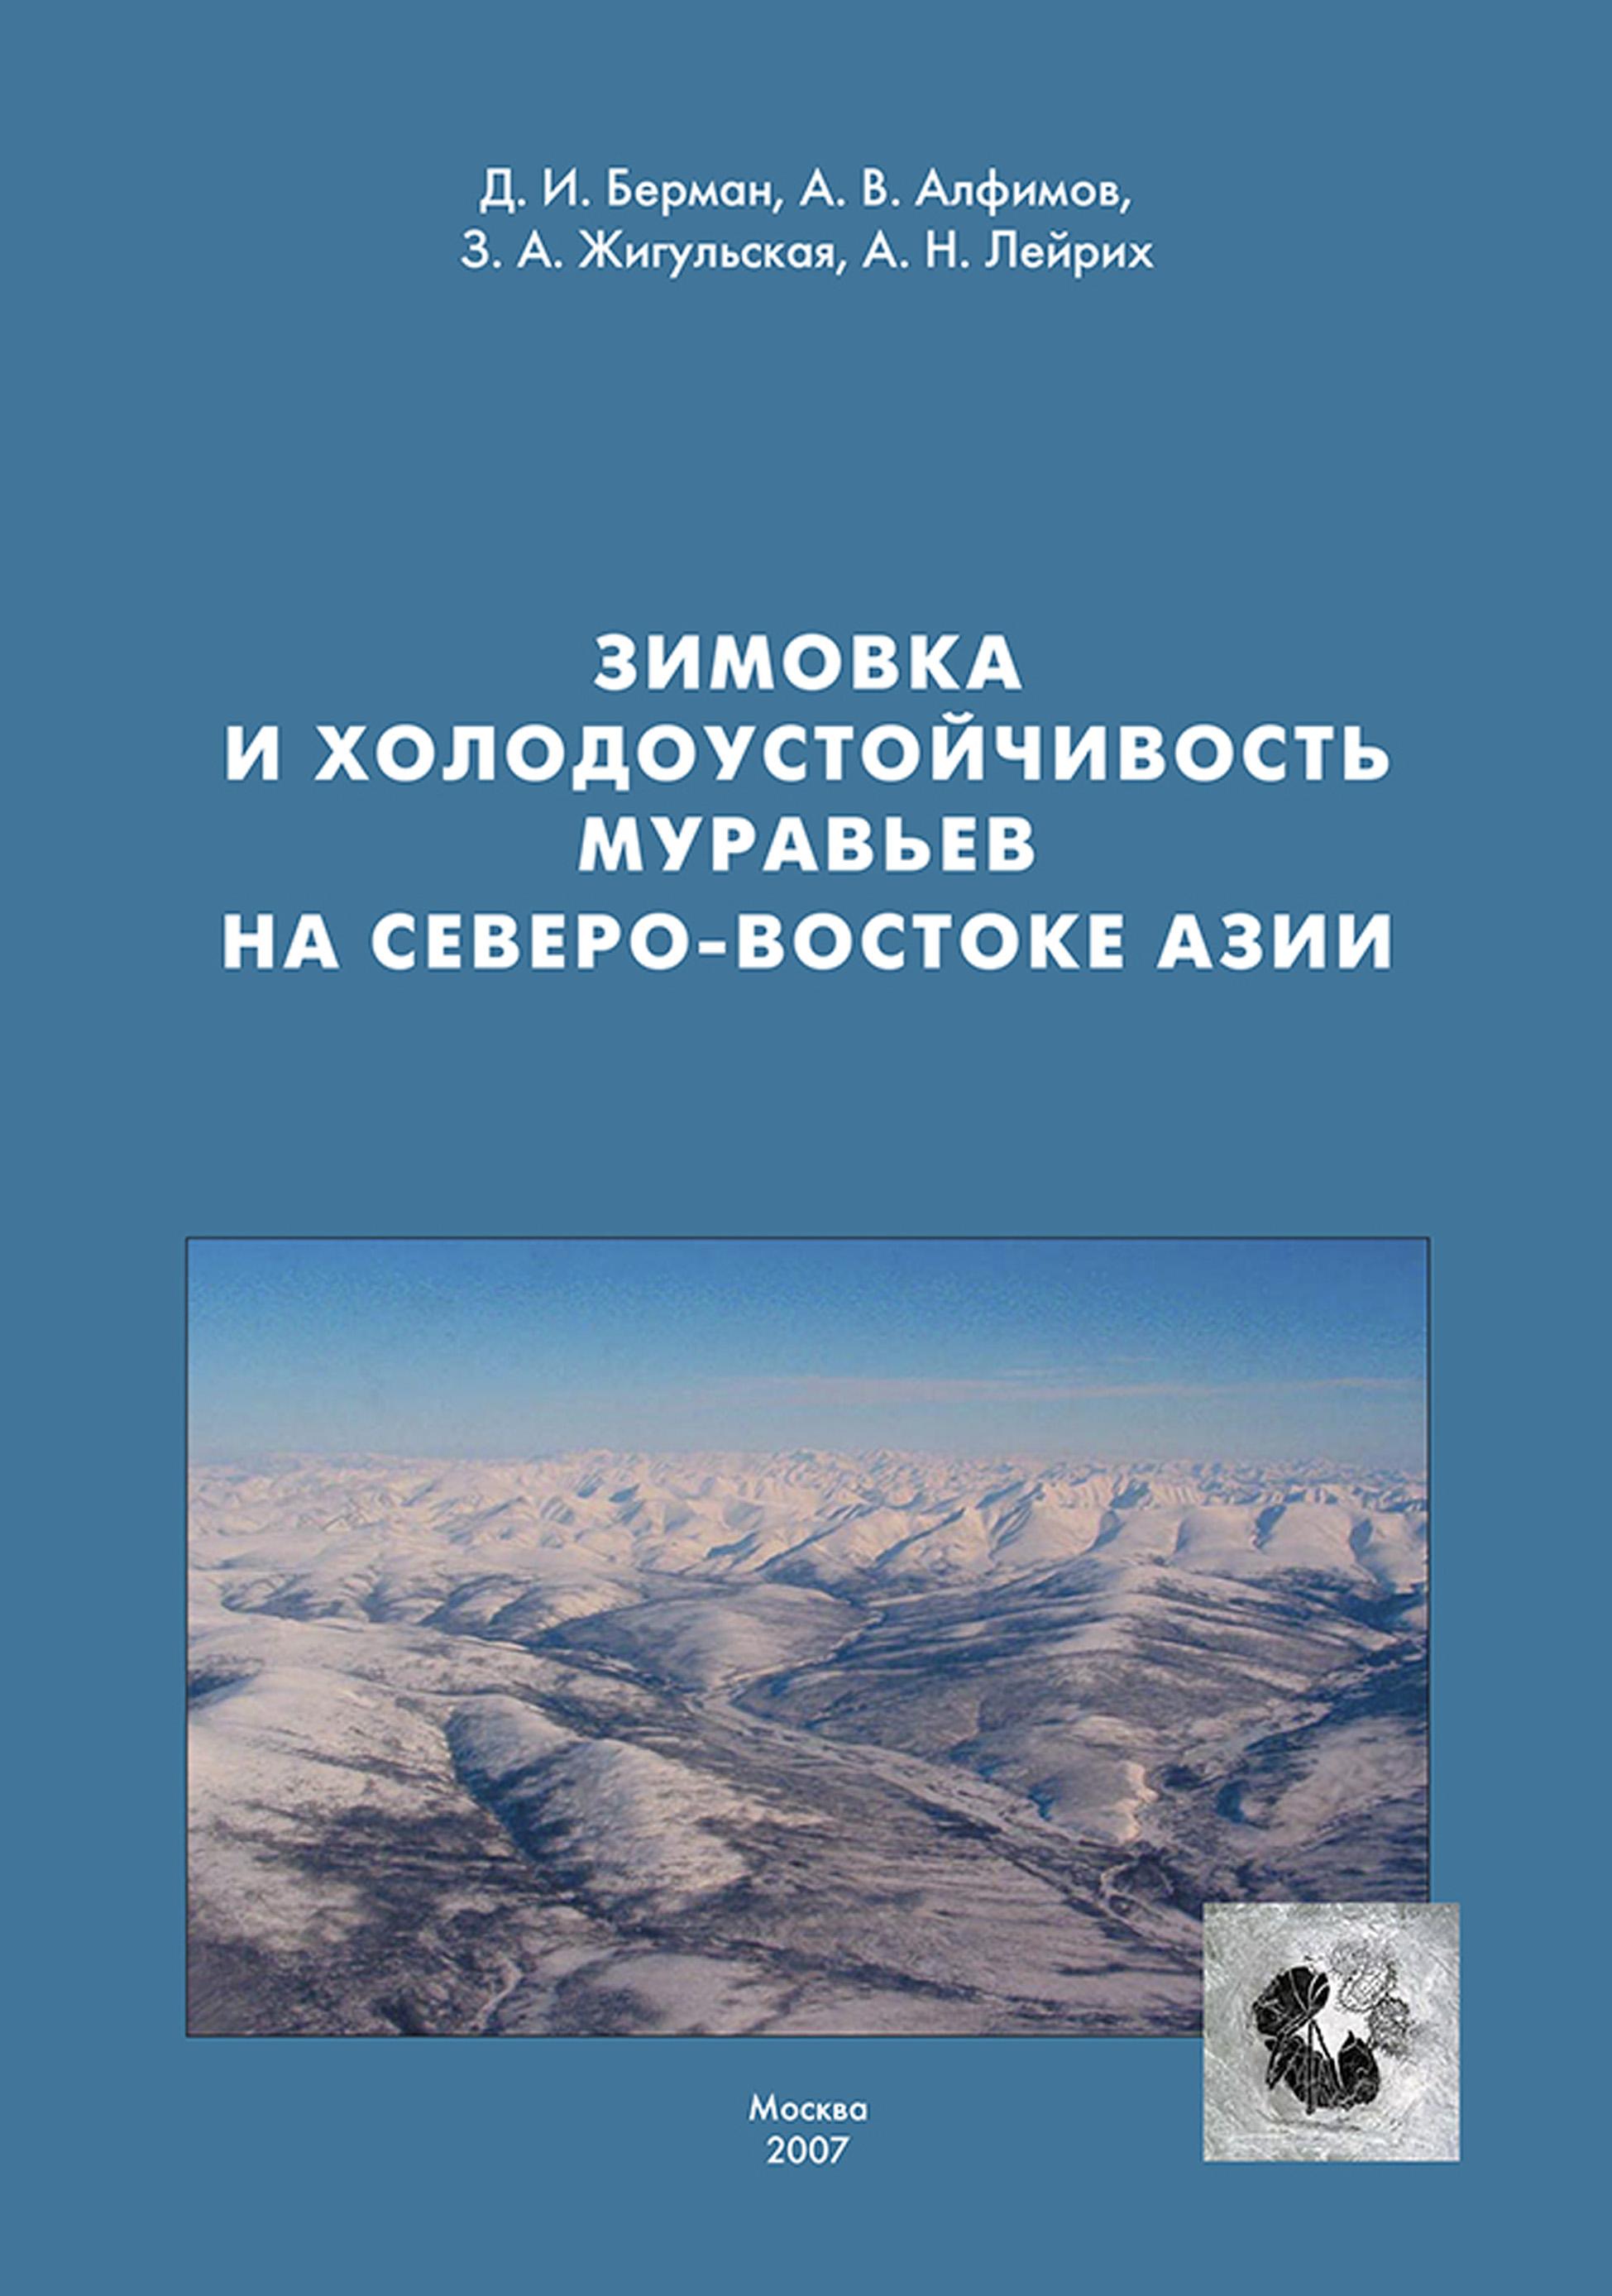 Д. И. Берман Зимовка и холодоустойчивость муравьев на северо-востоке Азии берман д и зимовка и холодоустойчивость муравьев на северо востоке азии